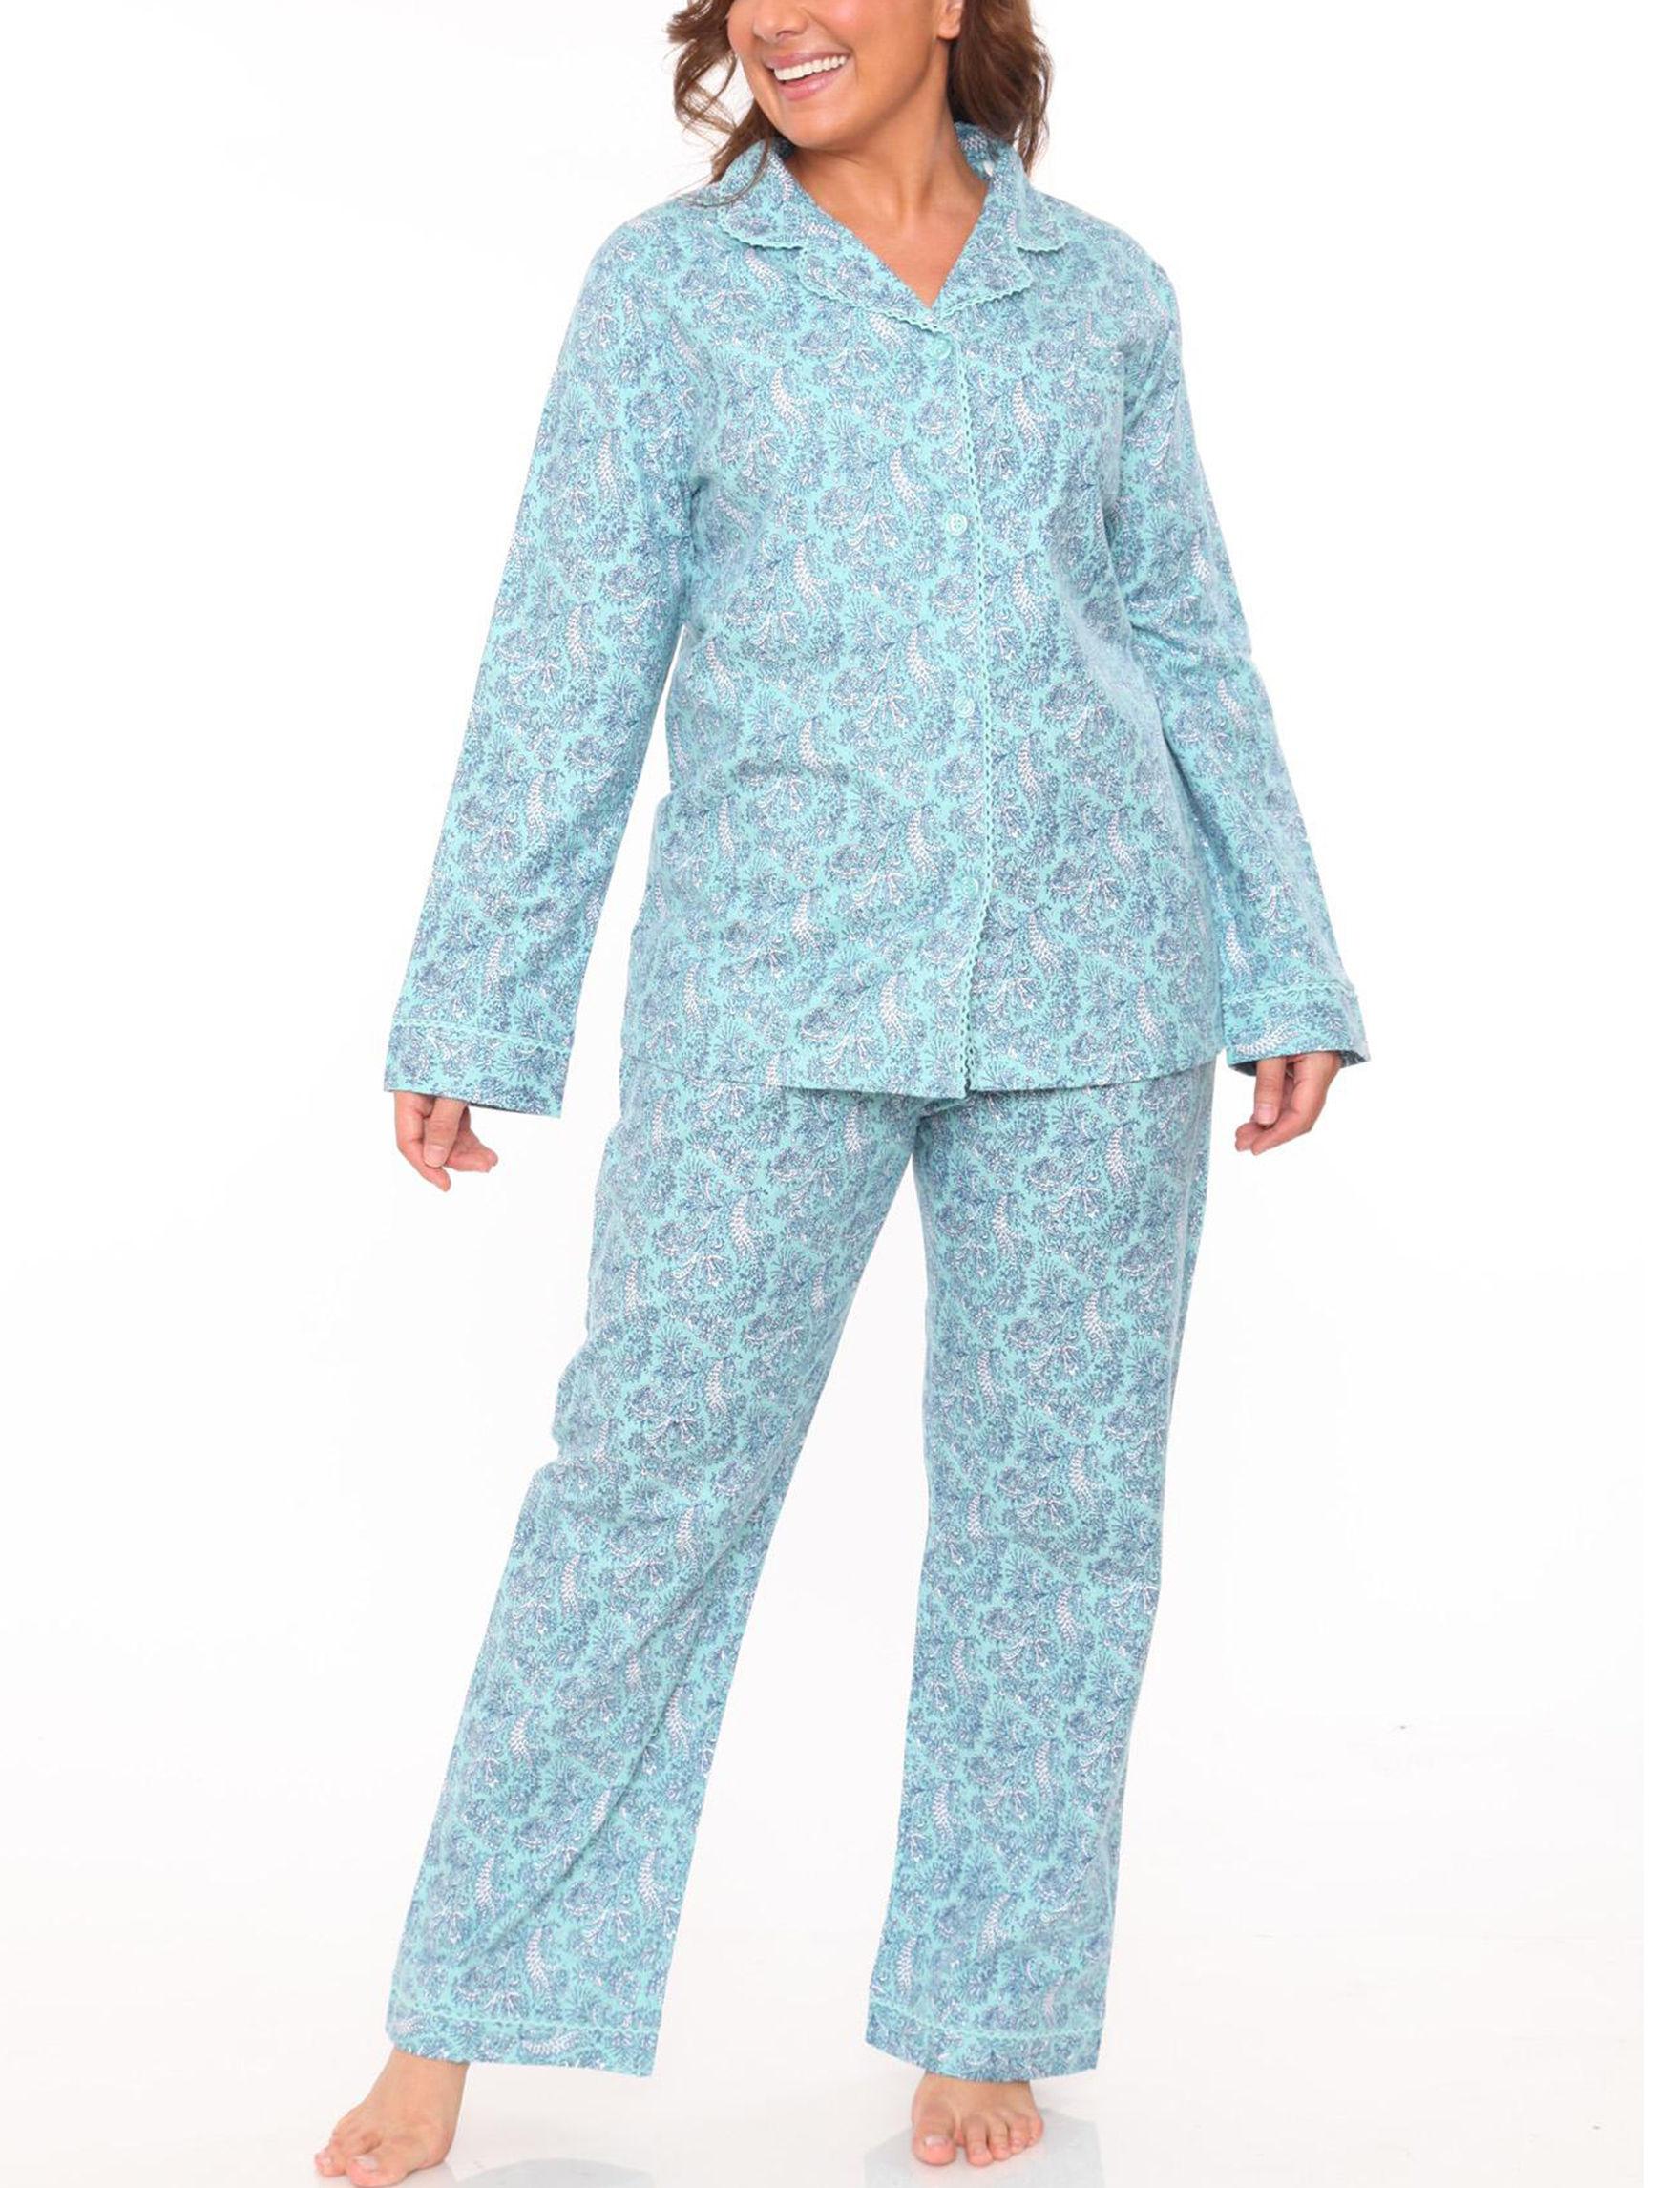 White Mark Mint Pajama Sets